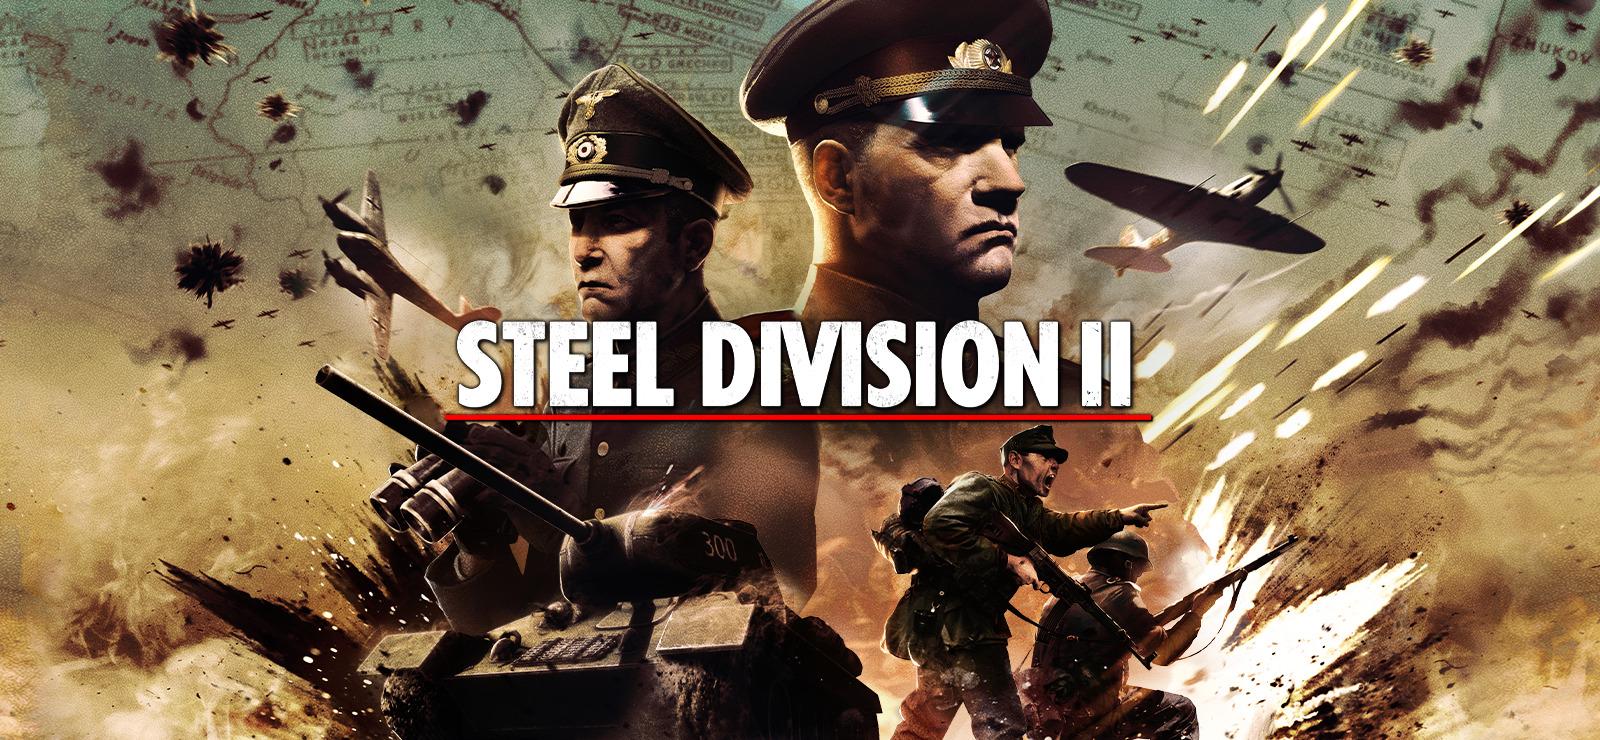 Steel Division 2 - Burning Baltics Free Download